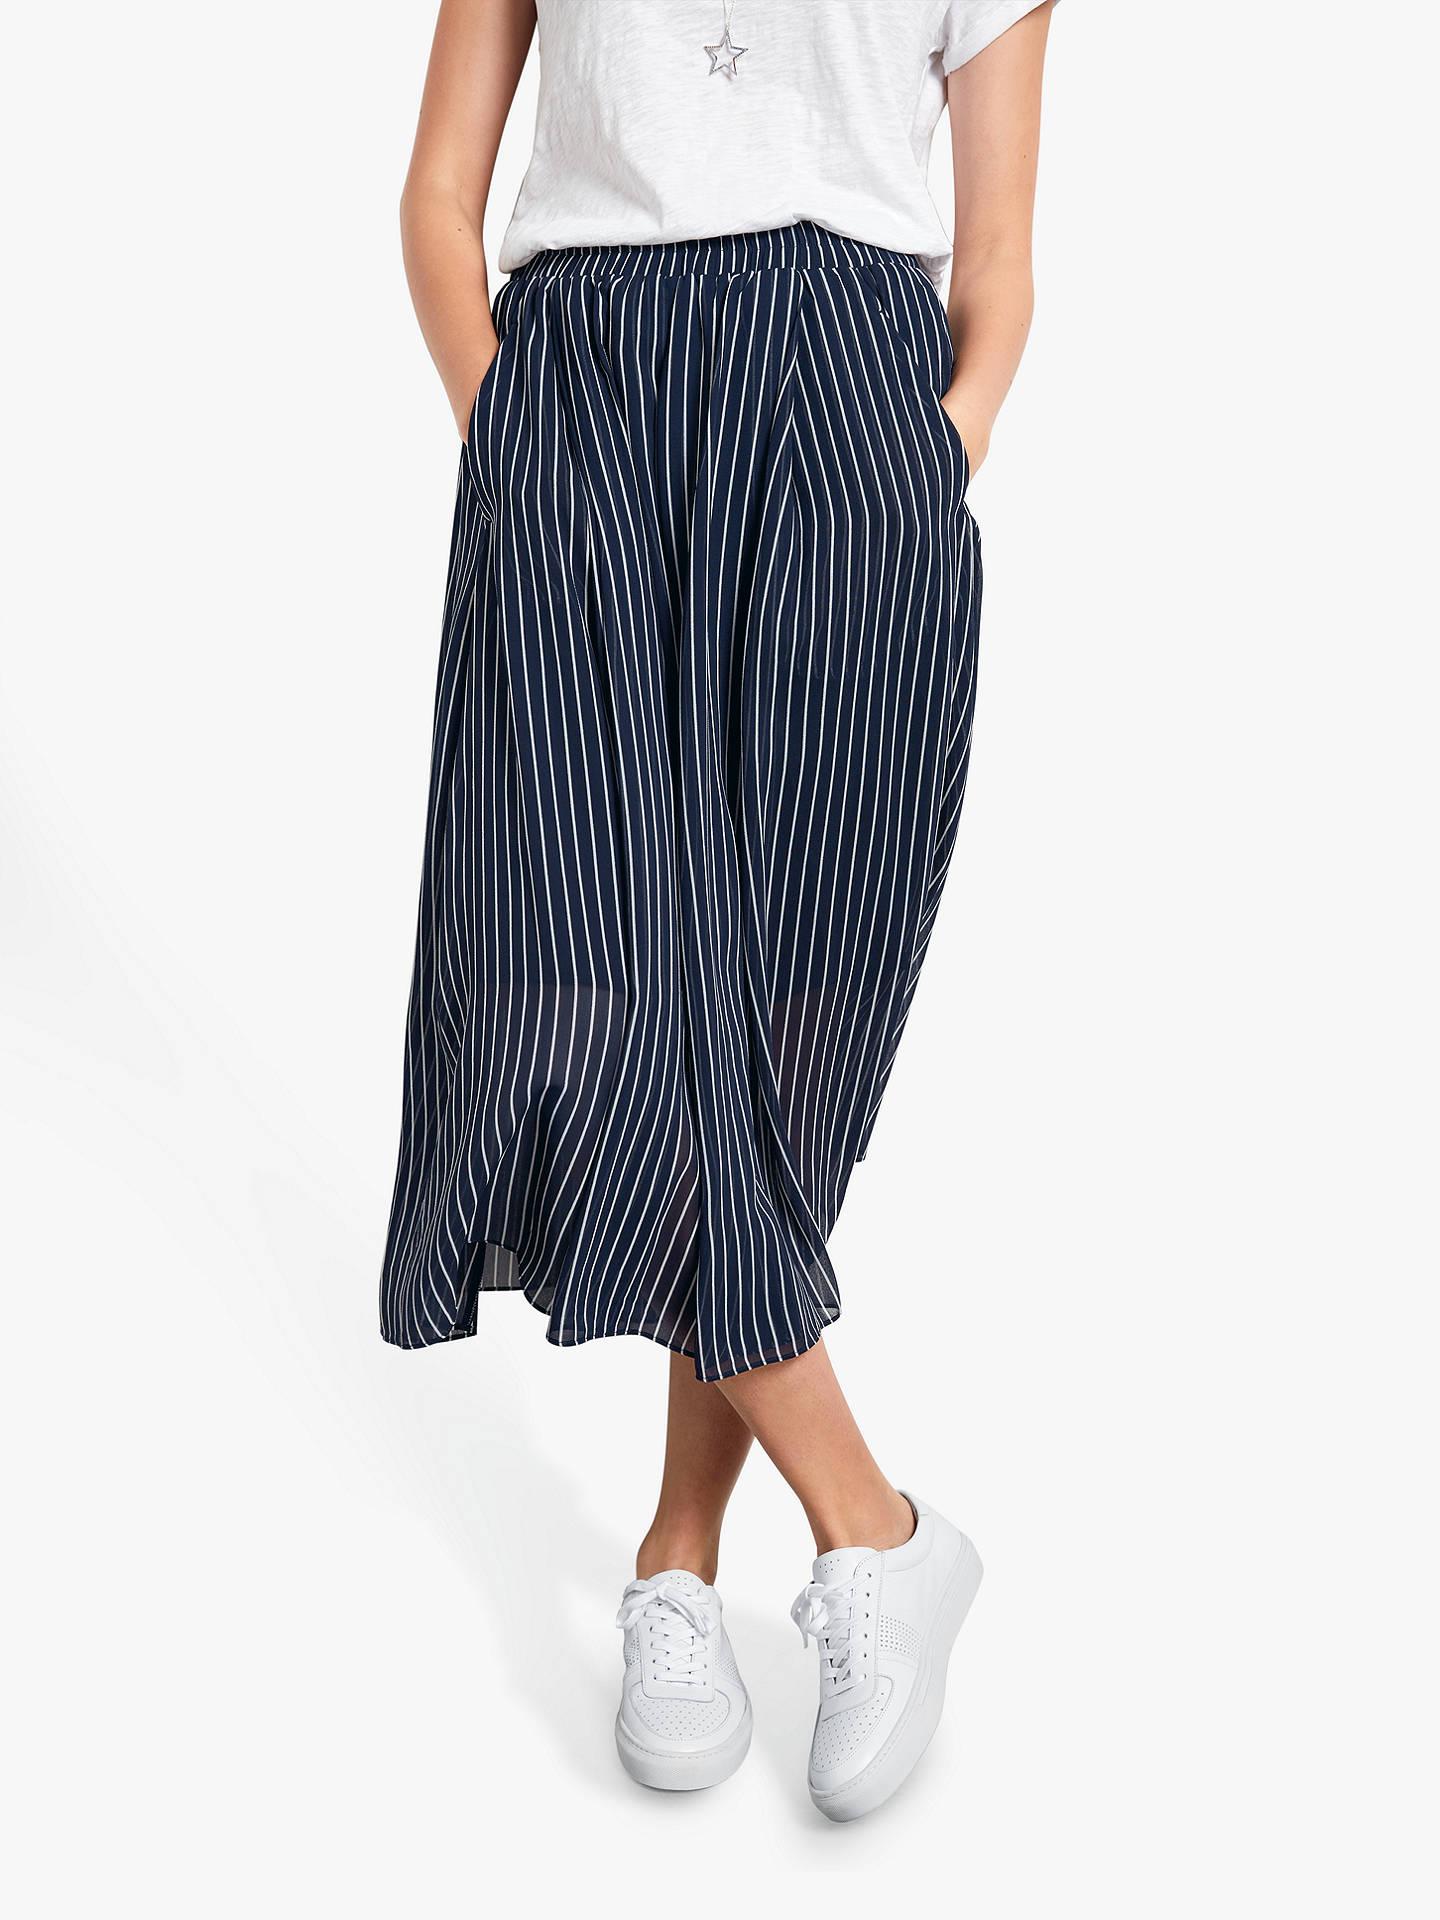 291b3fab8 Buy hush Marina Stripe Midi Skirt, Midnight Blue/White, 8 Online at  johnlewis ...